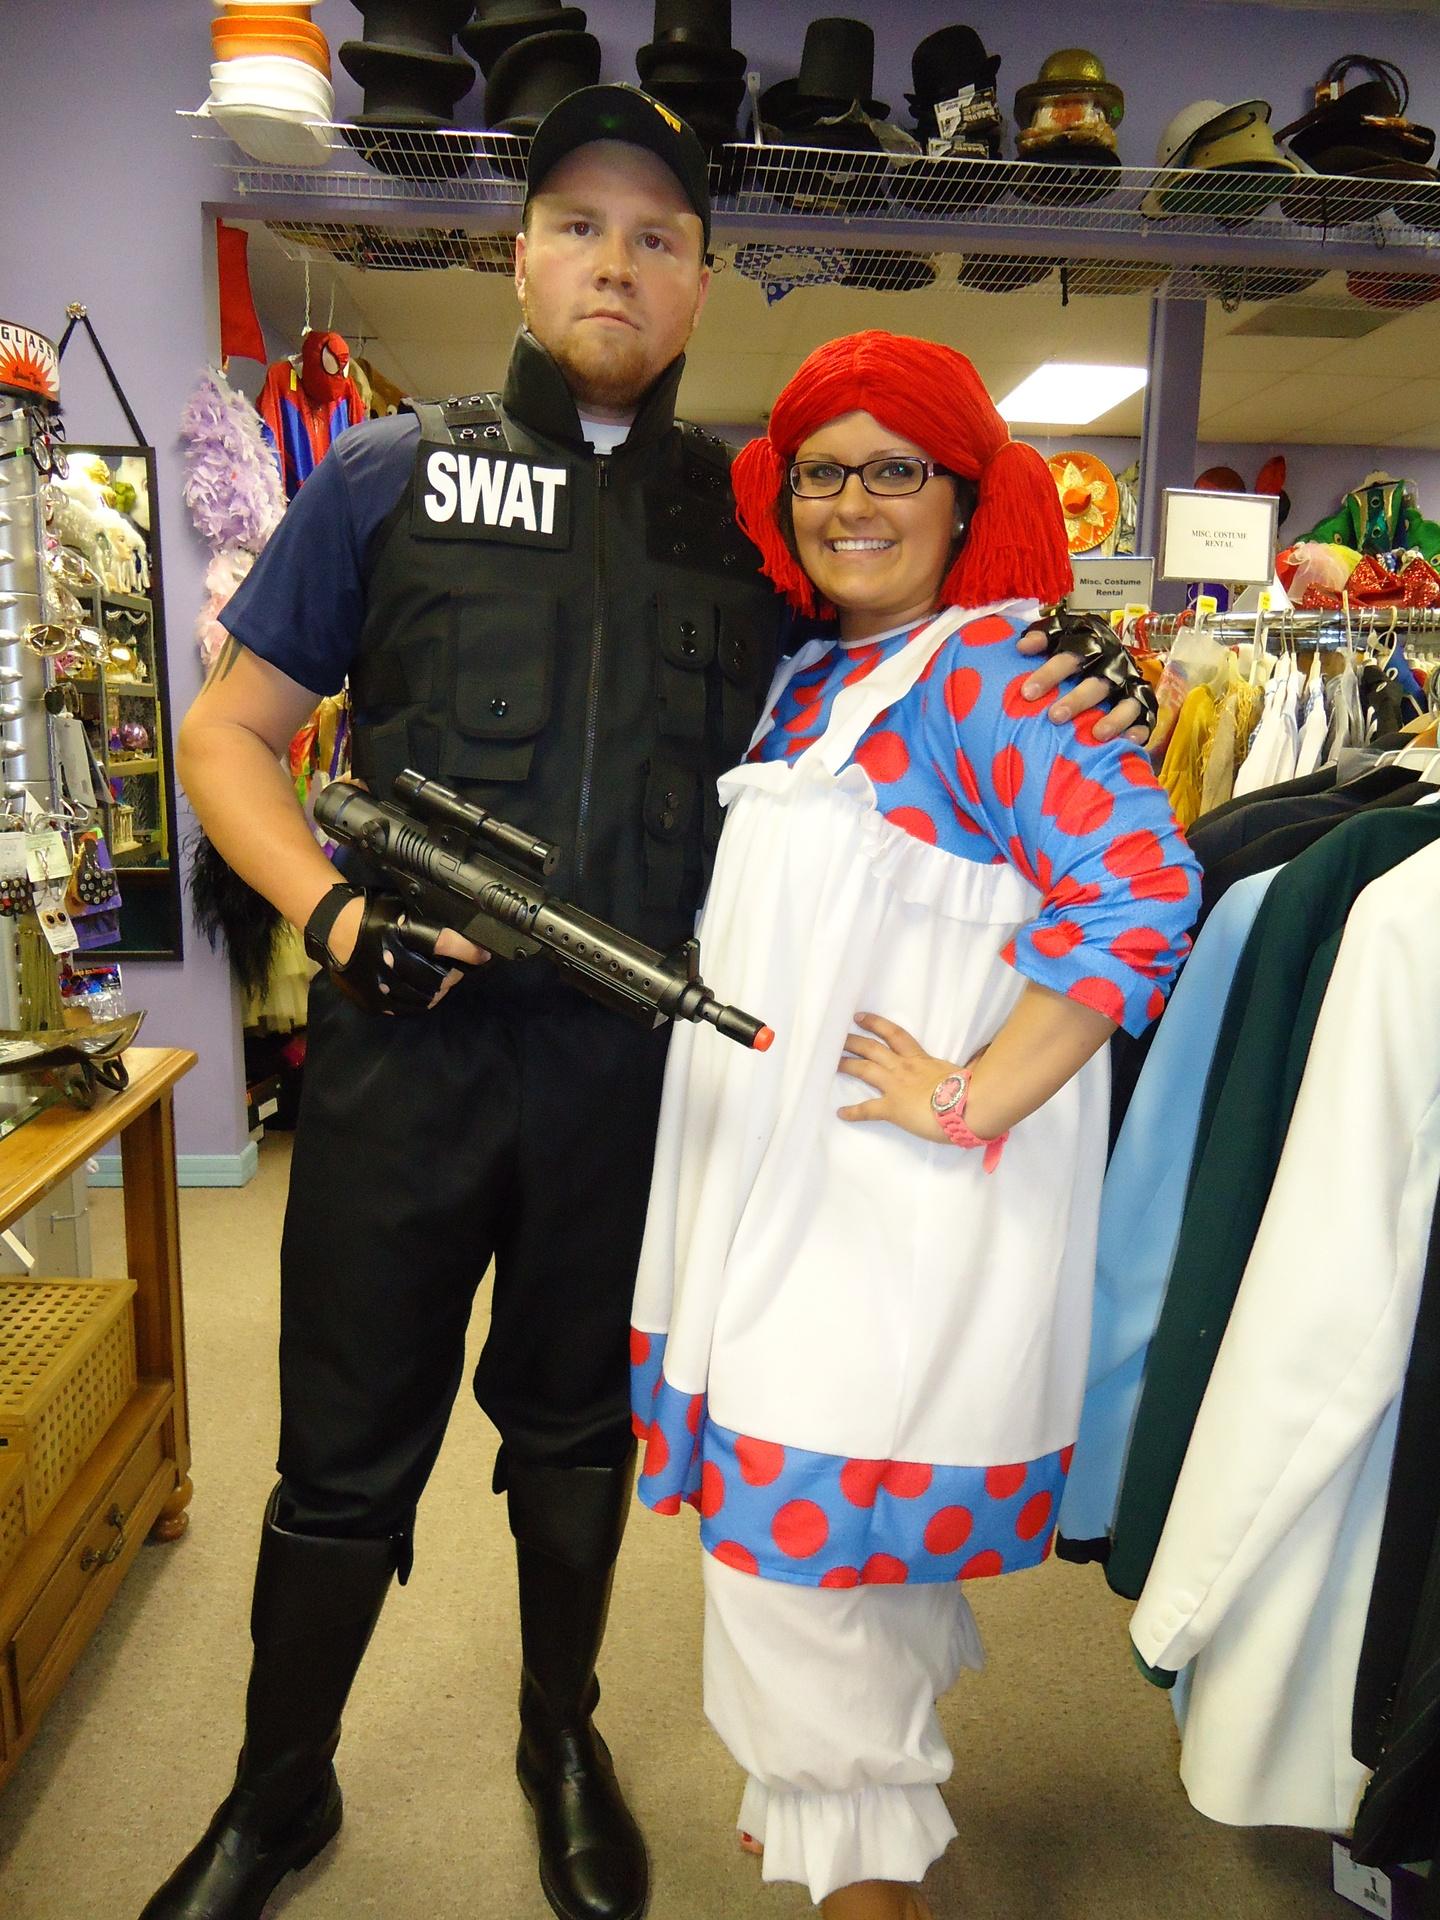 Swat  arresting Raggedy Ann